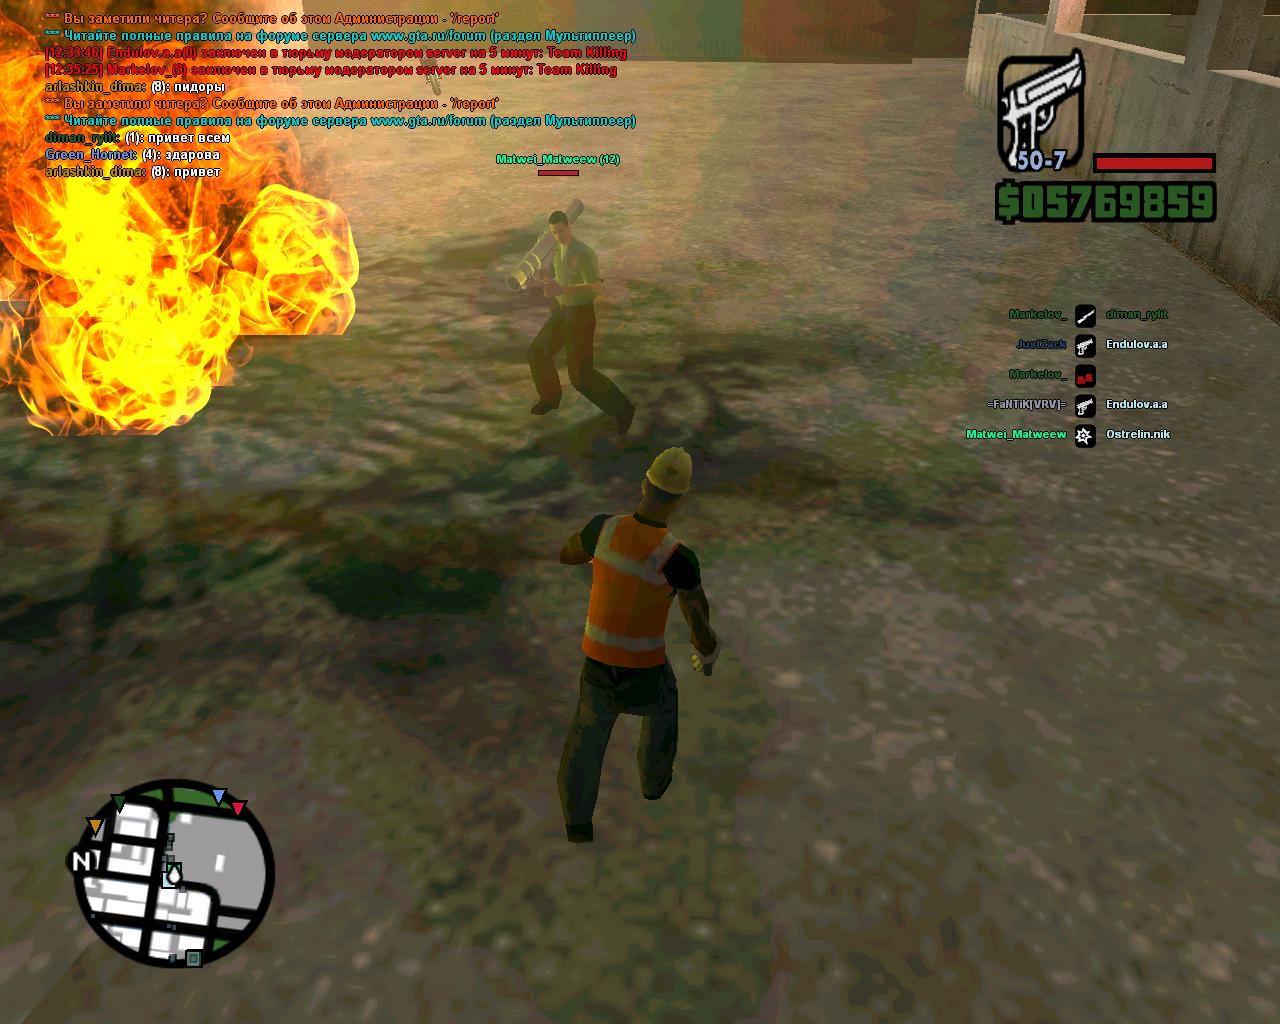 Cheater - Grand Theft Auto: San Andreas